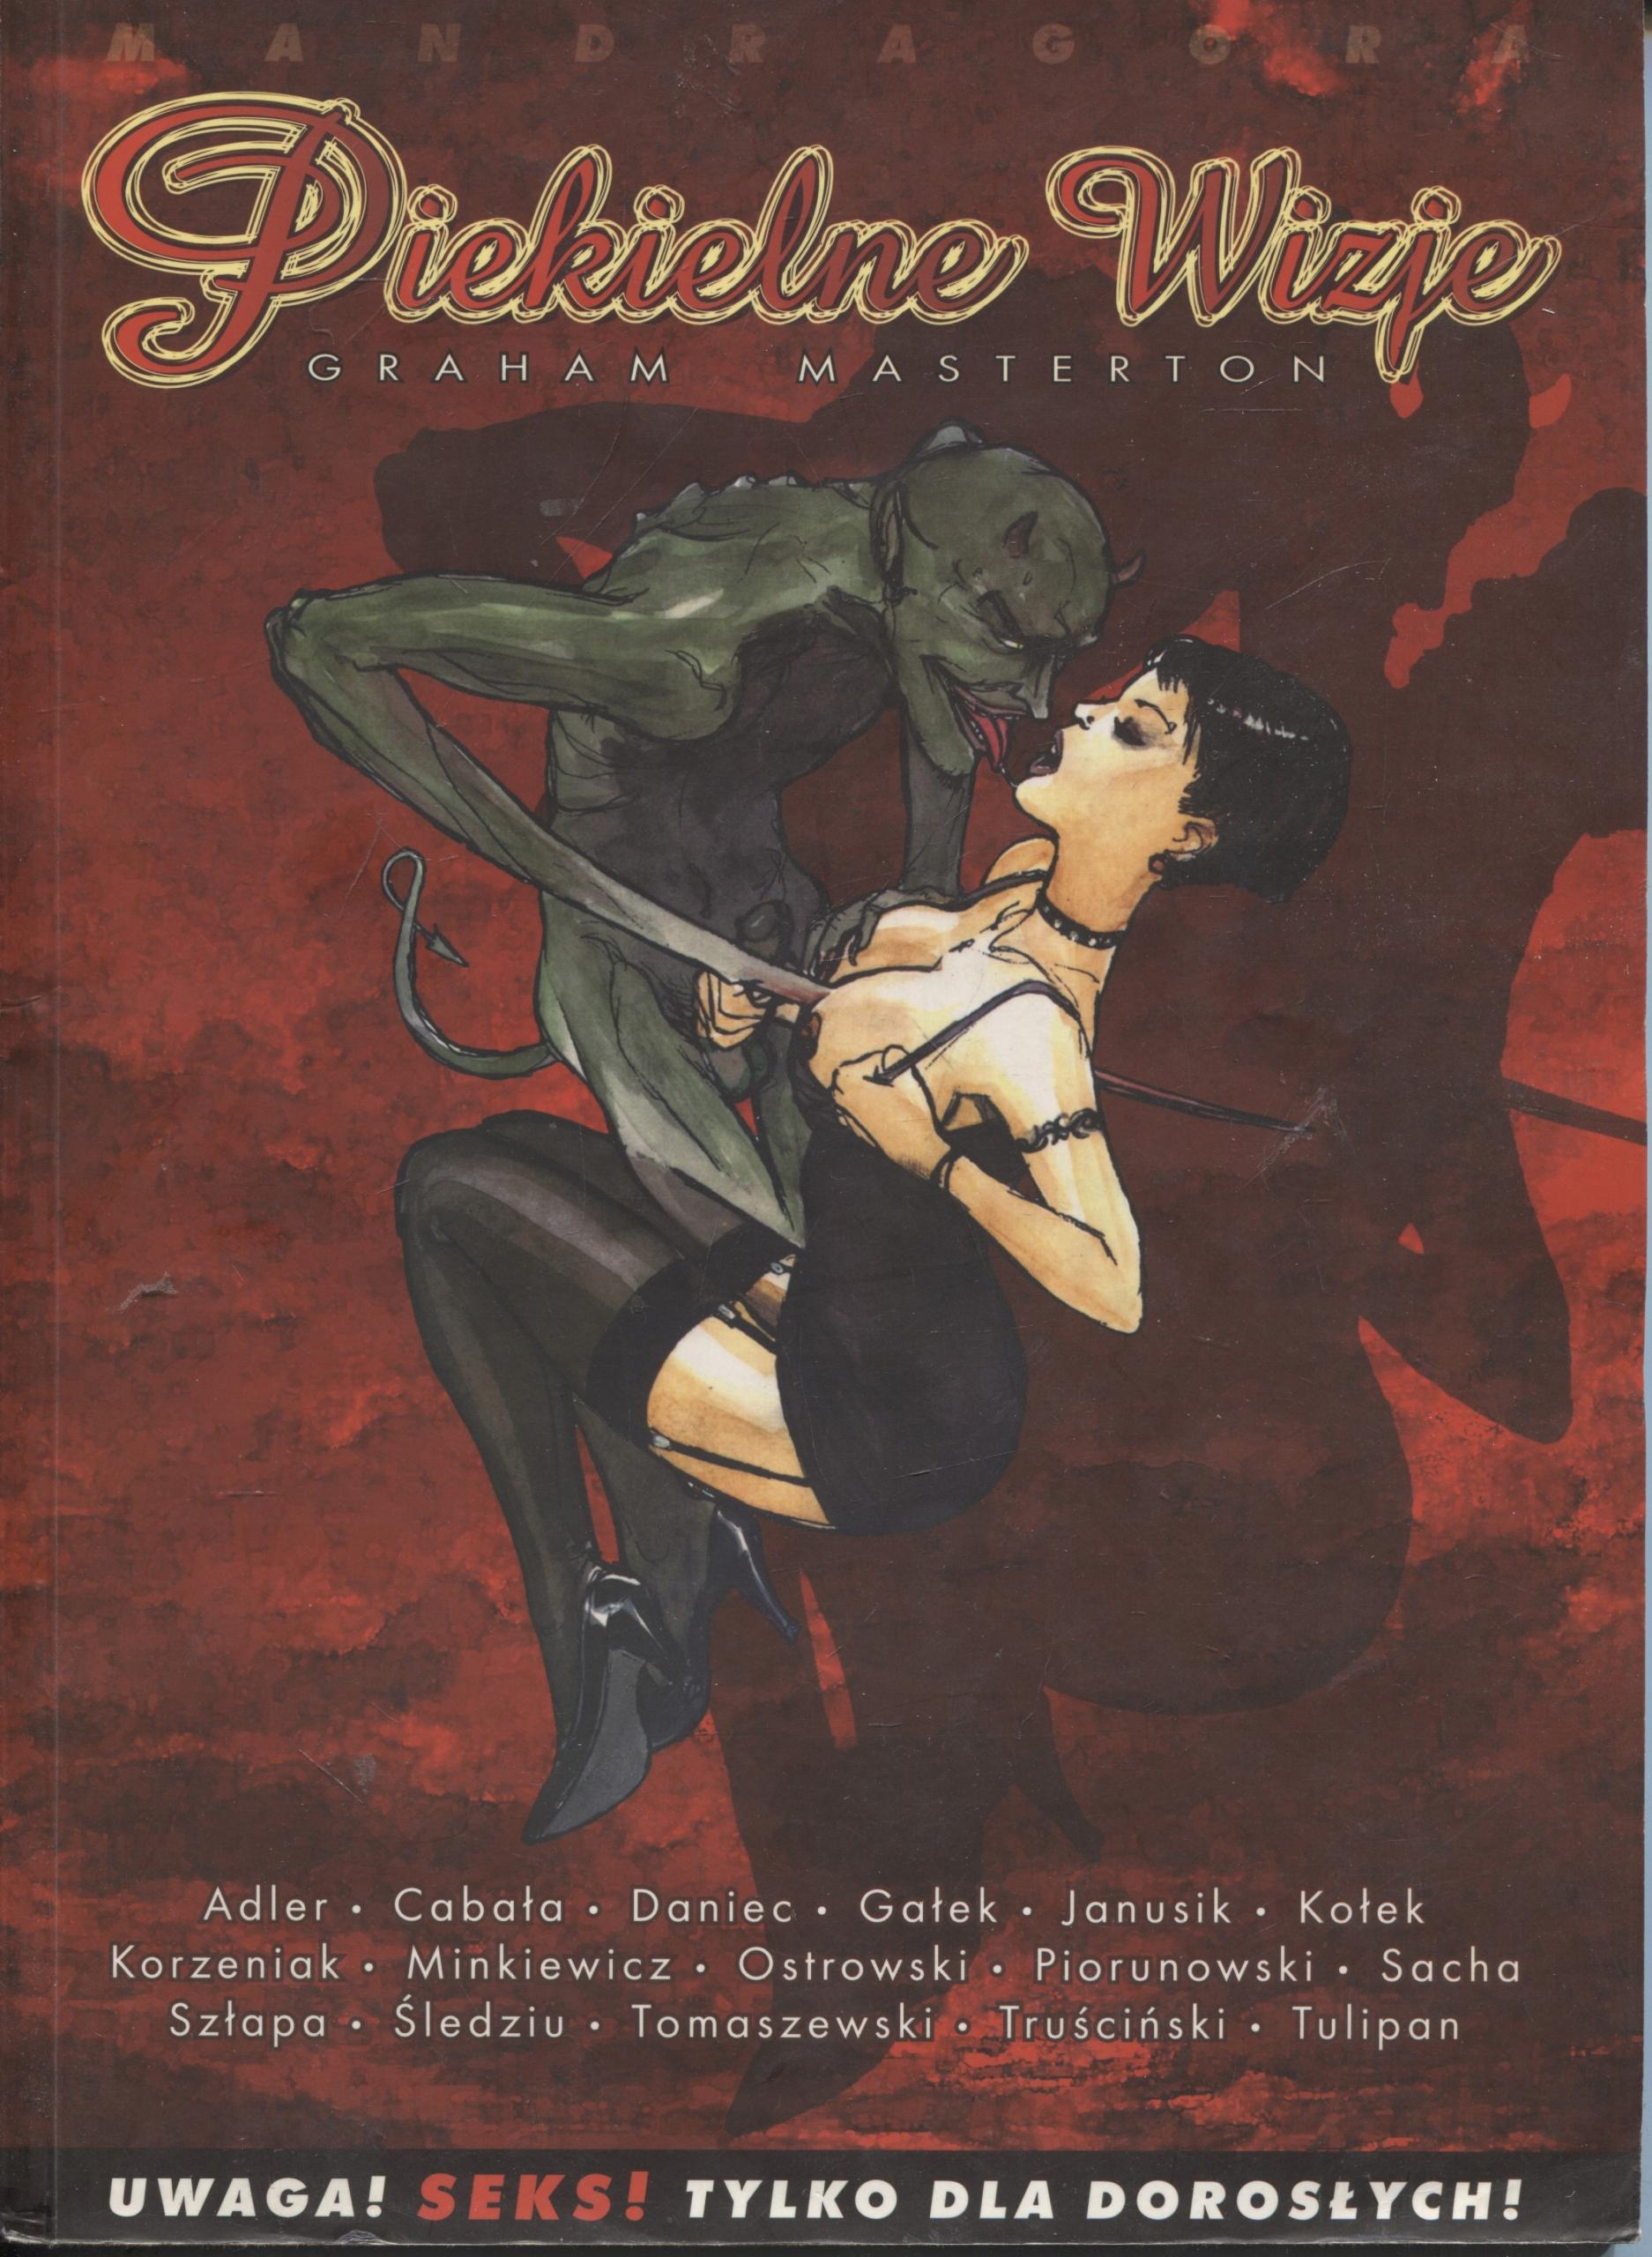 Piekielne wizje - Graham Masterton / komiks